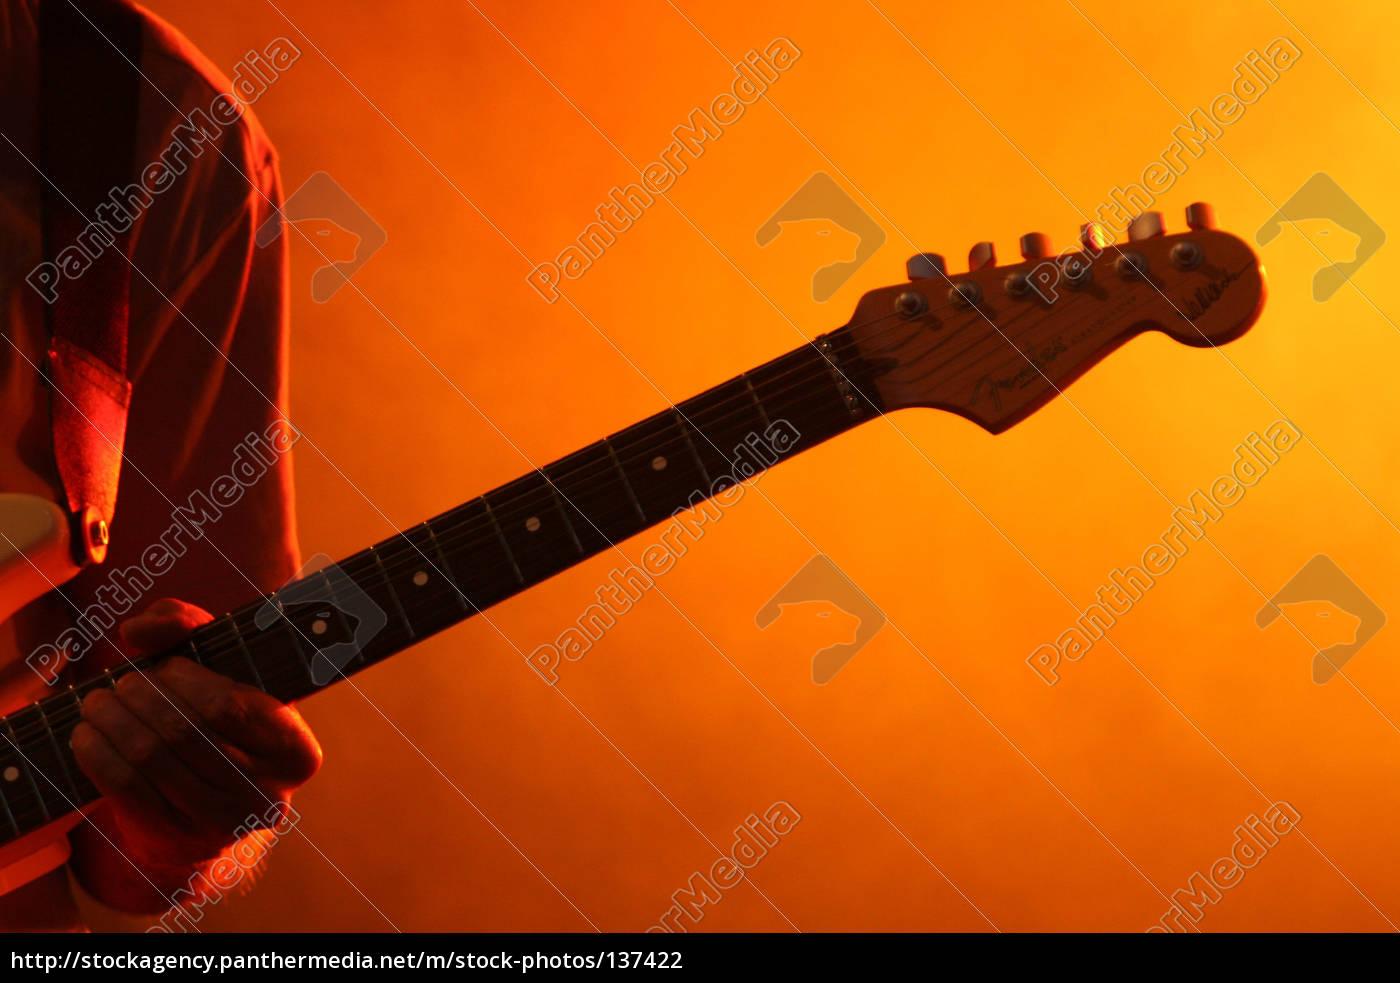 playin, guitar - 137422